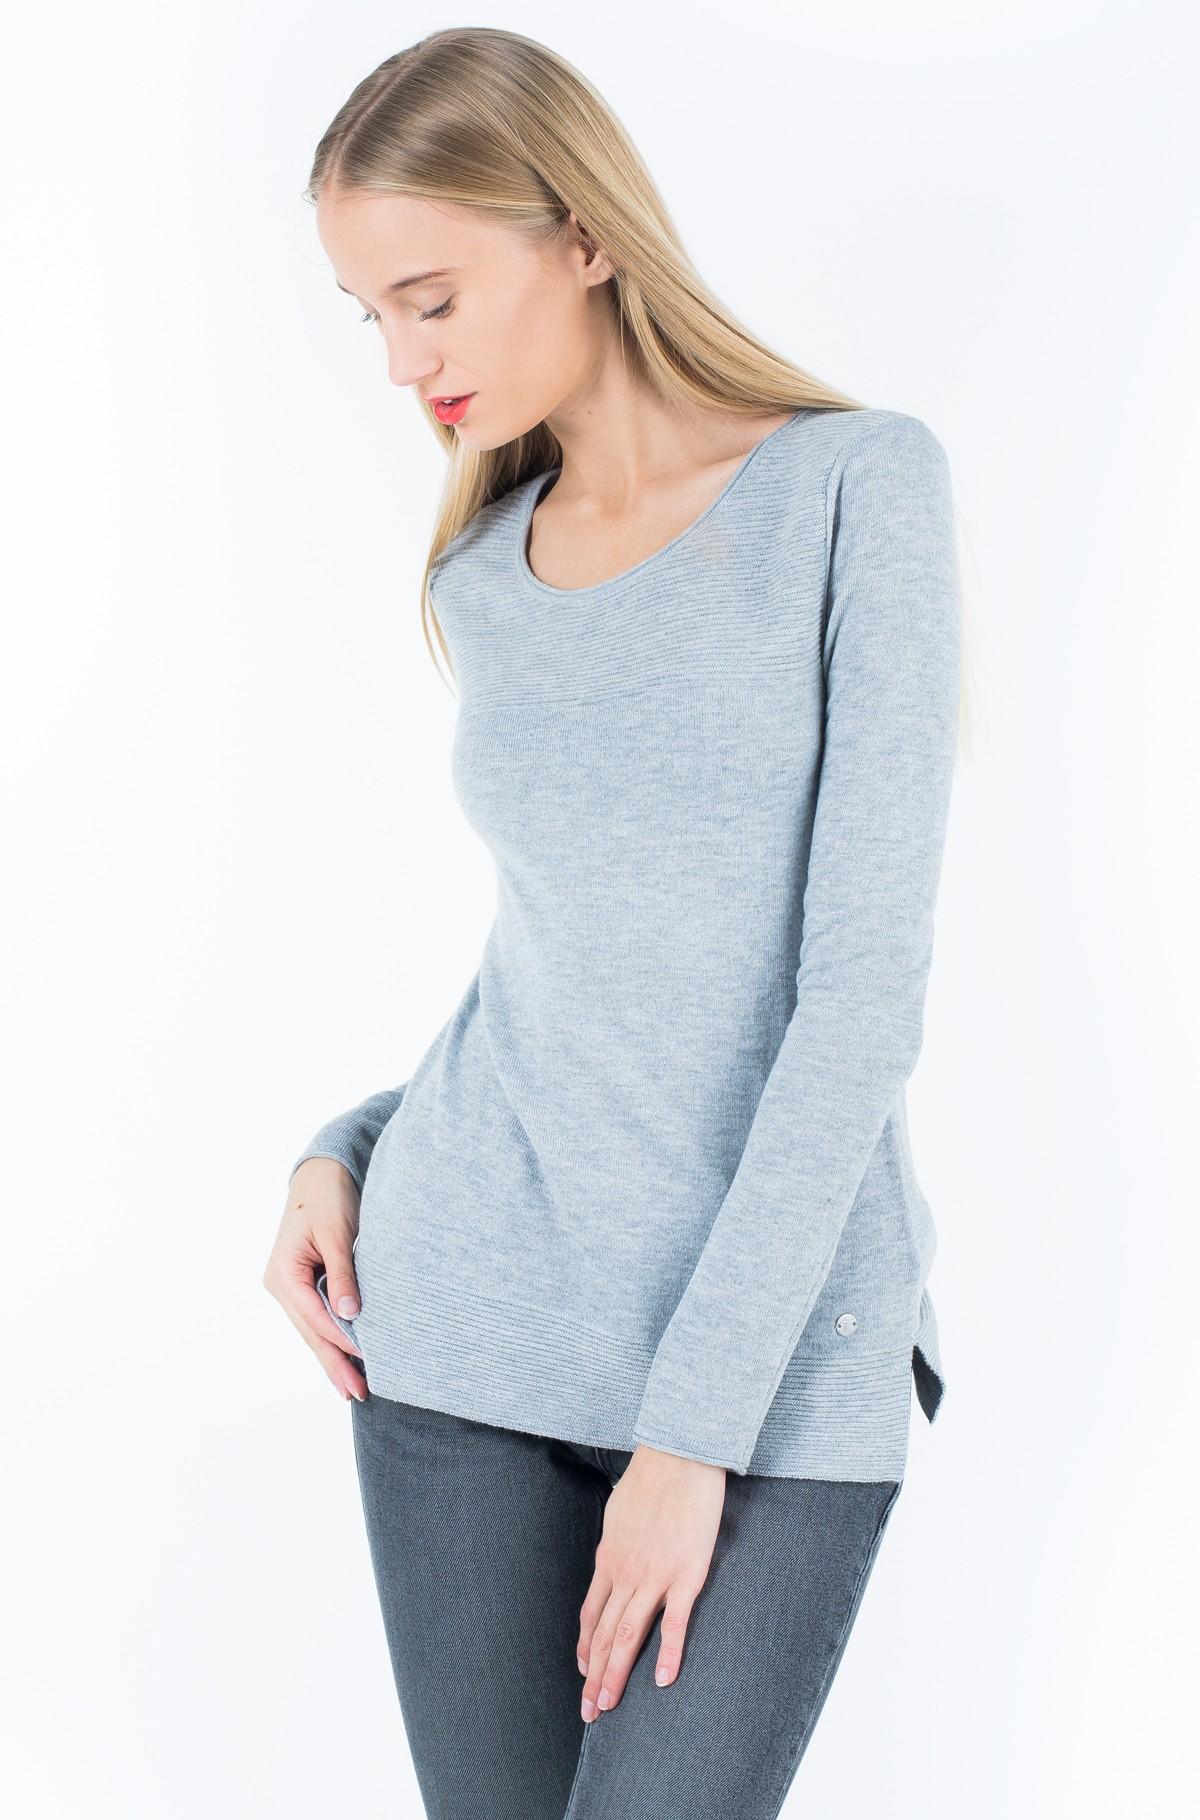 Sweater 3023304.00.70-full-1